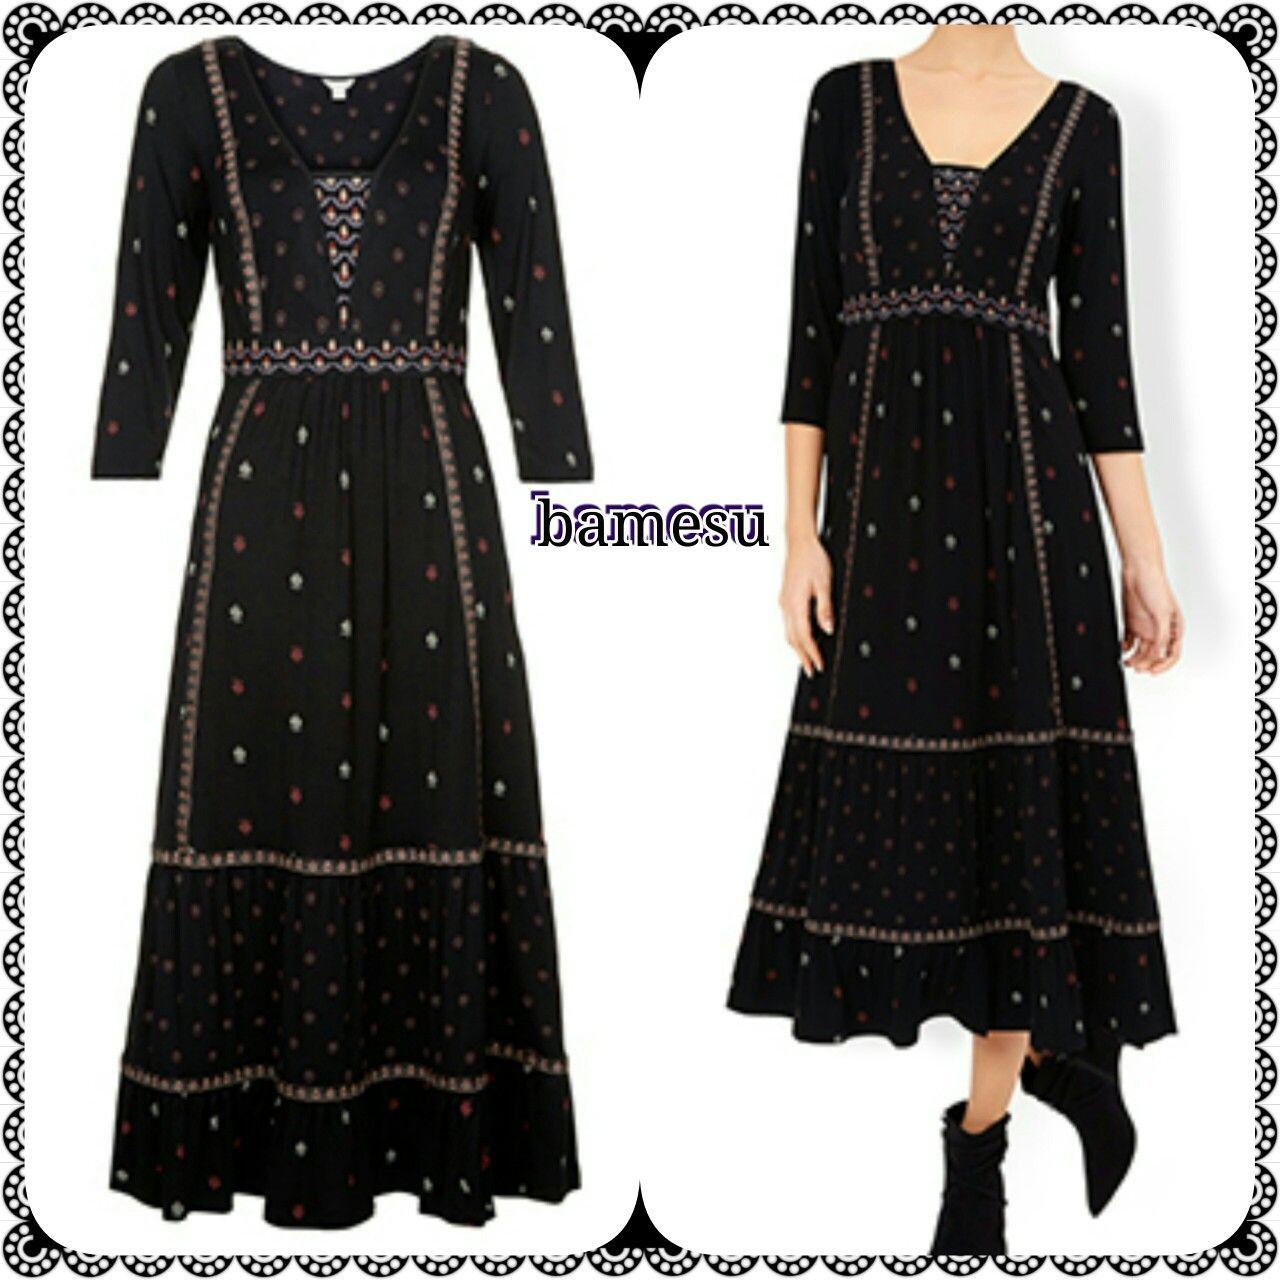 Toptan Tekstil Turkiye Turkey Istanbul Ankara Izmir Izmit Butik Fashion Moda Giyim Bayangiyim Textile Kumas Toptankumas Elbiseler Giyim Elbise